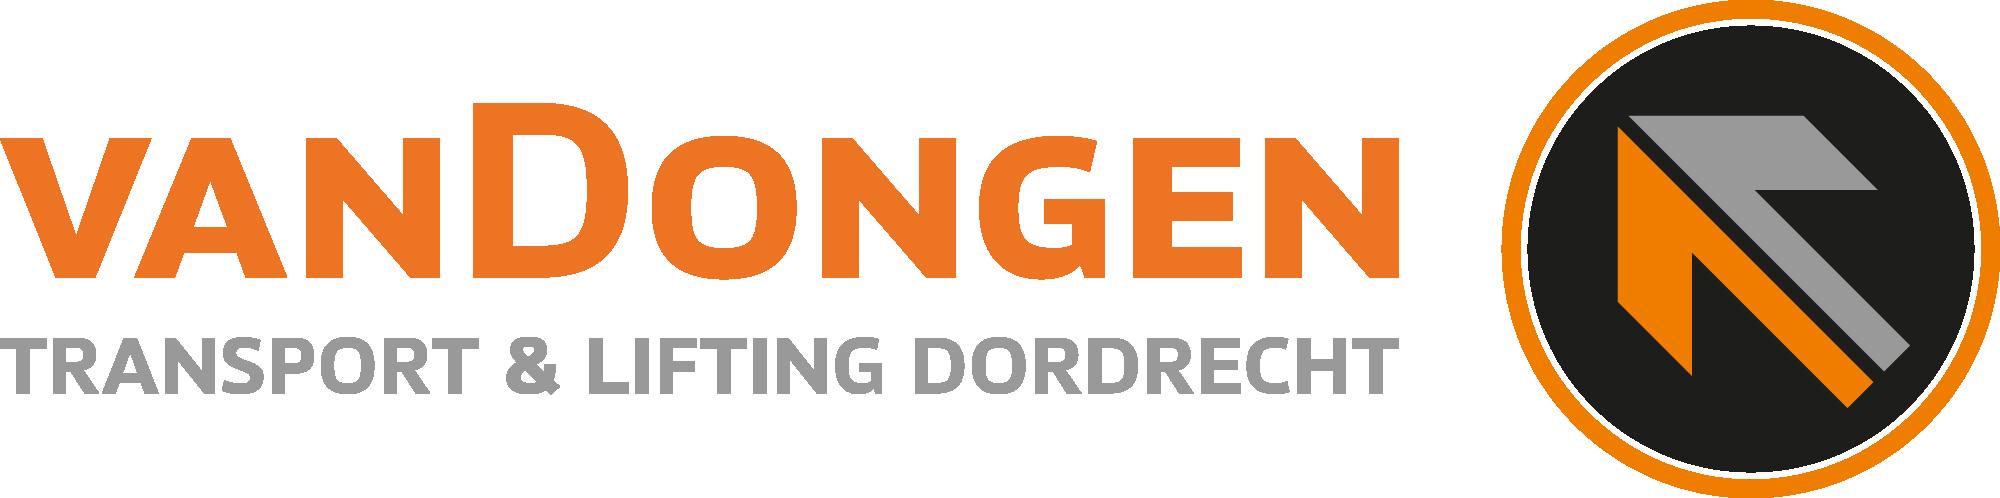 Van Dongen Transport & Lifting